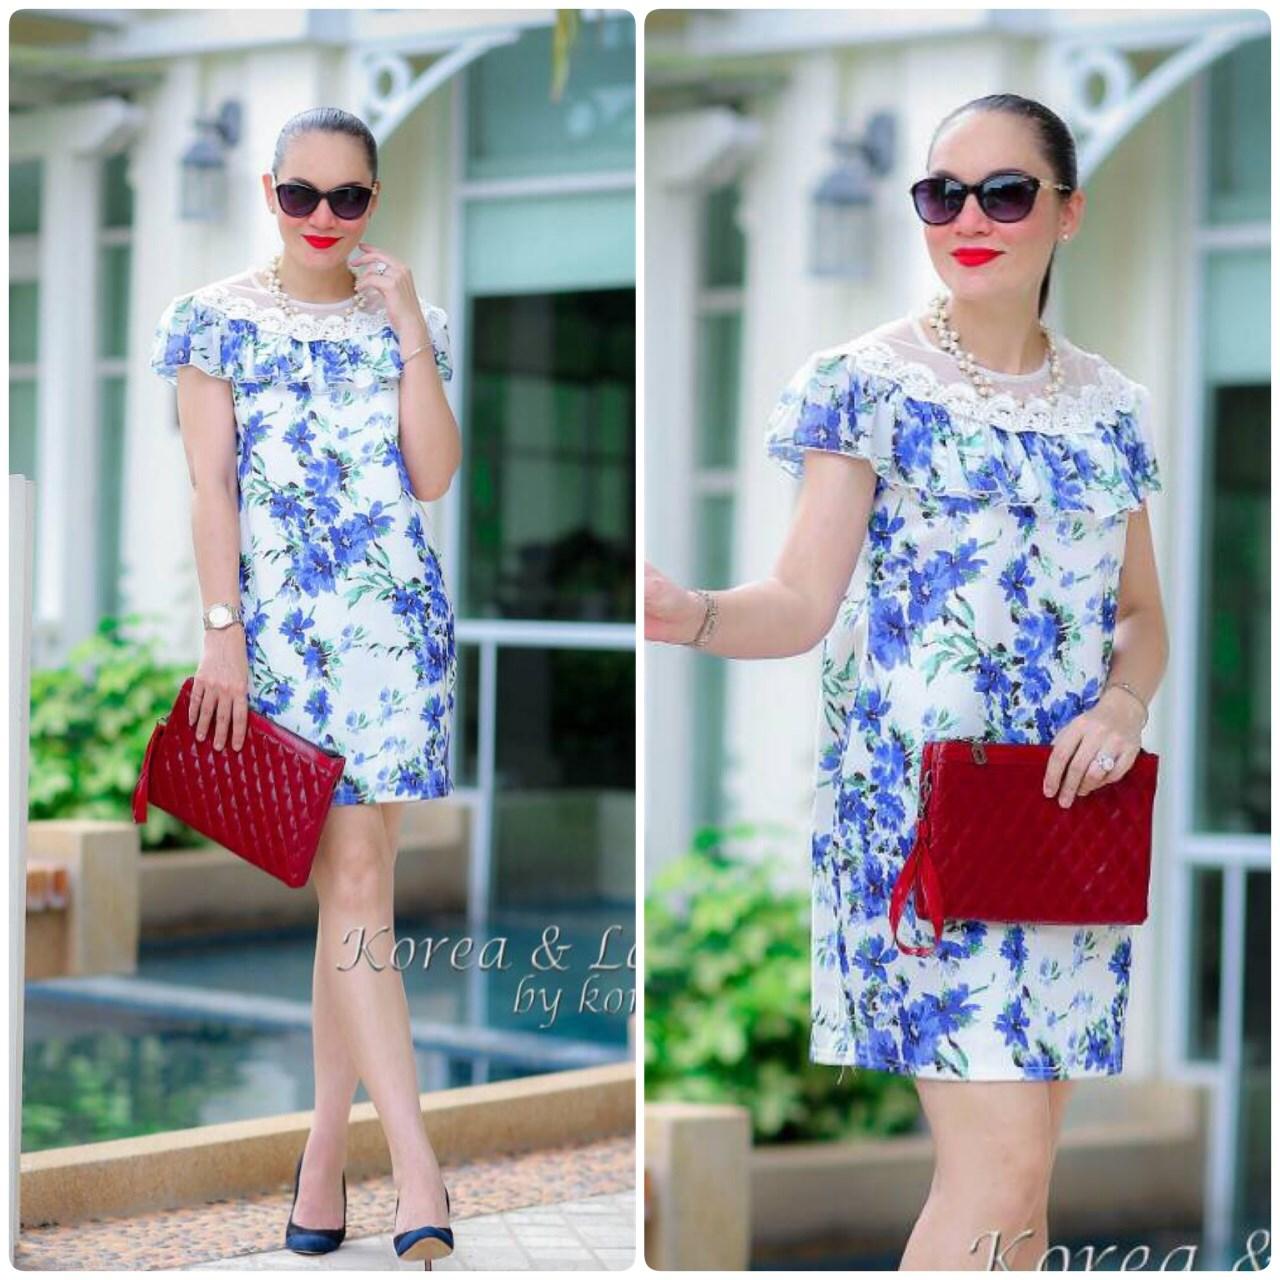 "TK0338 **พร้อมส่ง** รอบอก 38"" Dress Dior Nano & Chiffon พิมพ์ลายดอกไม้ สีฟ้า"